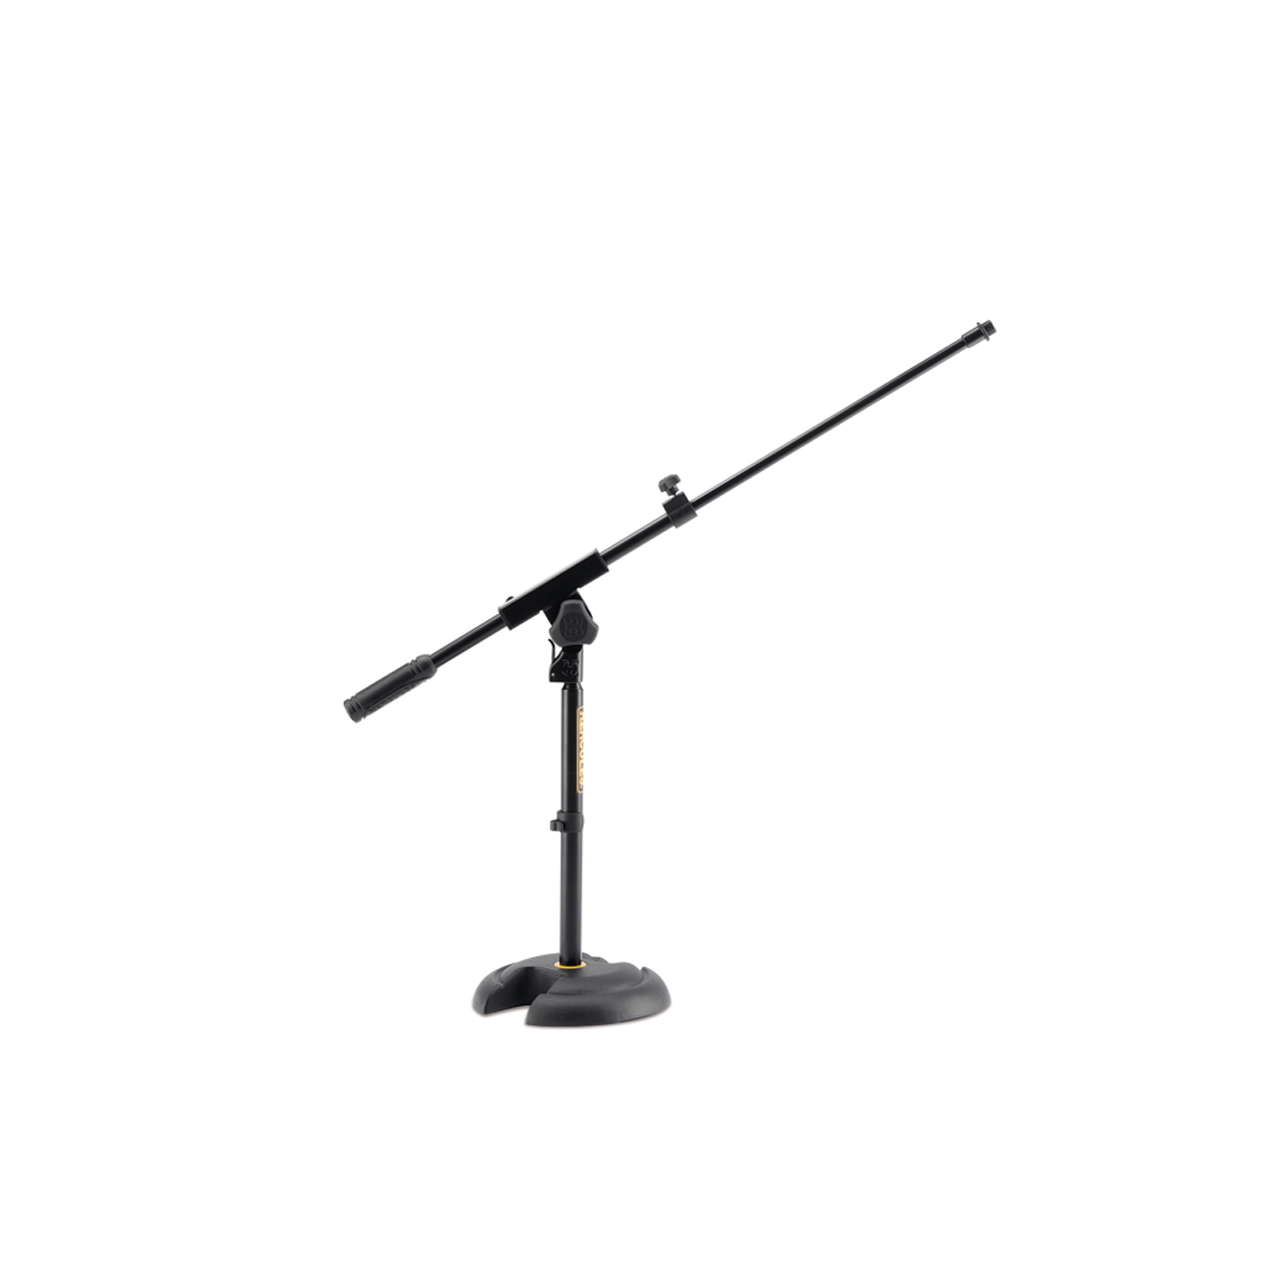 Suporte Pedestal Mini Girafa C/base Redonda P/ Microfone Ms120b Hercules  - Audio Video & cia